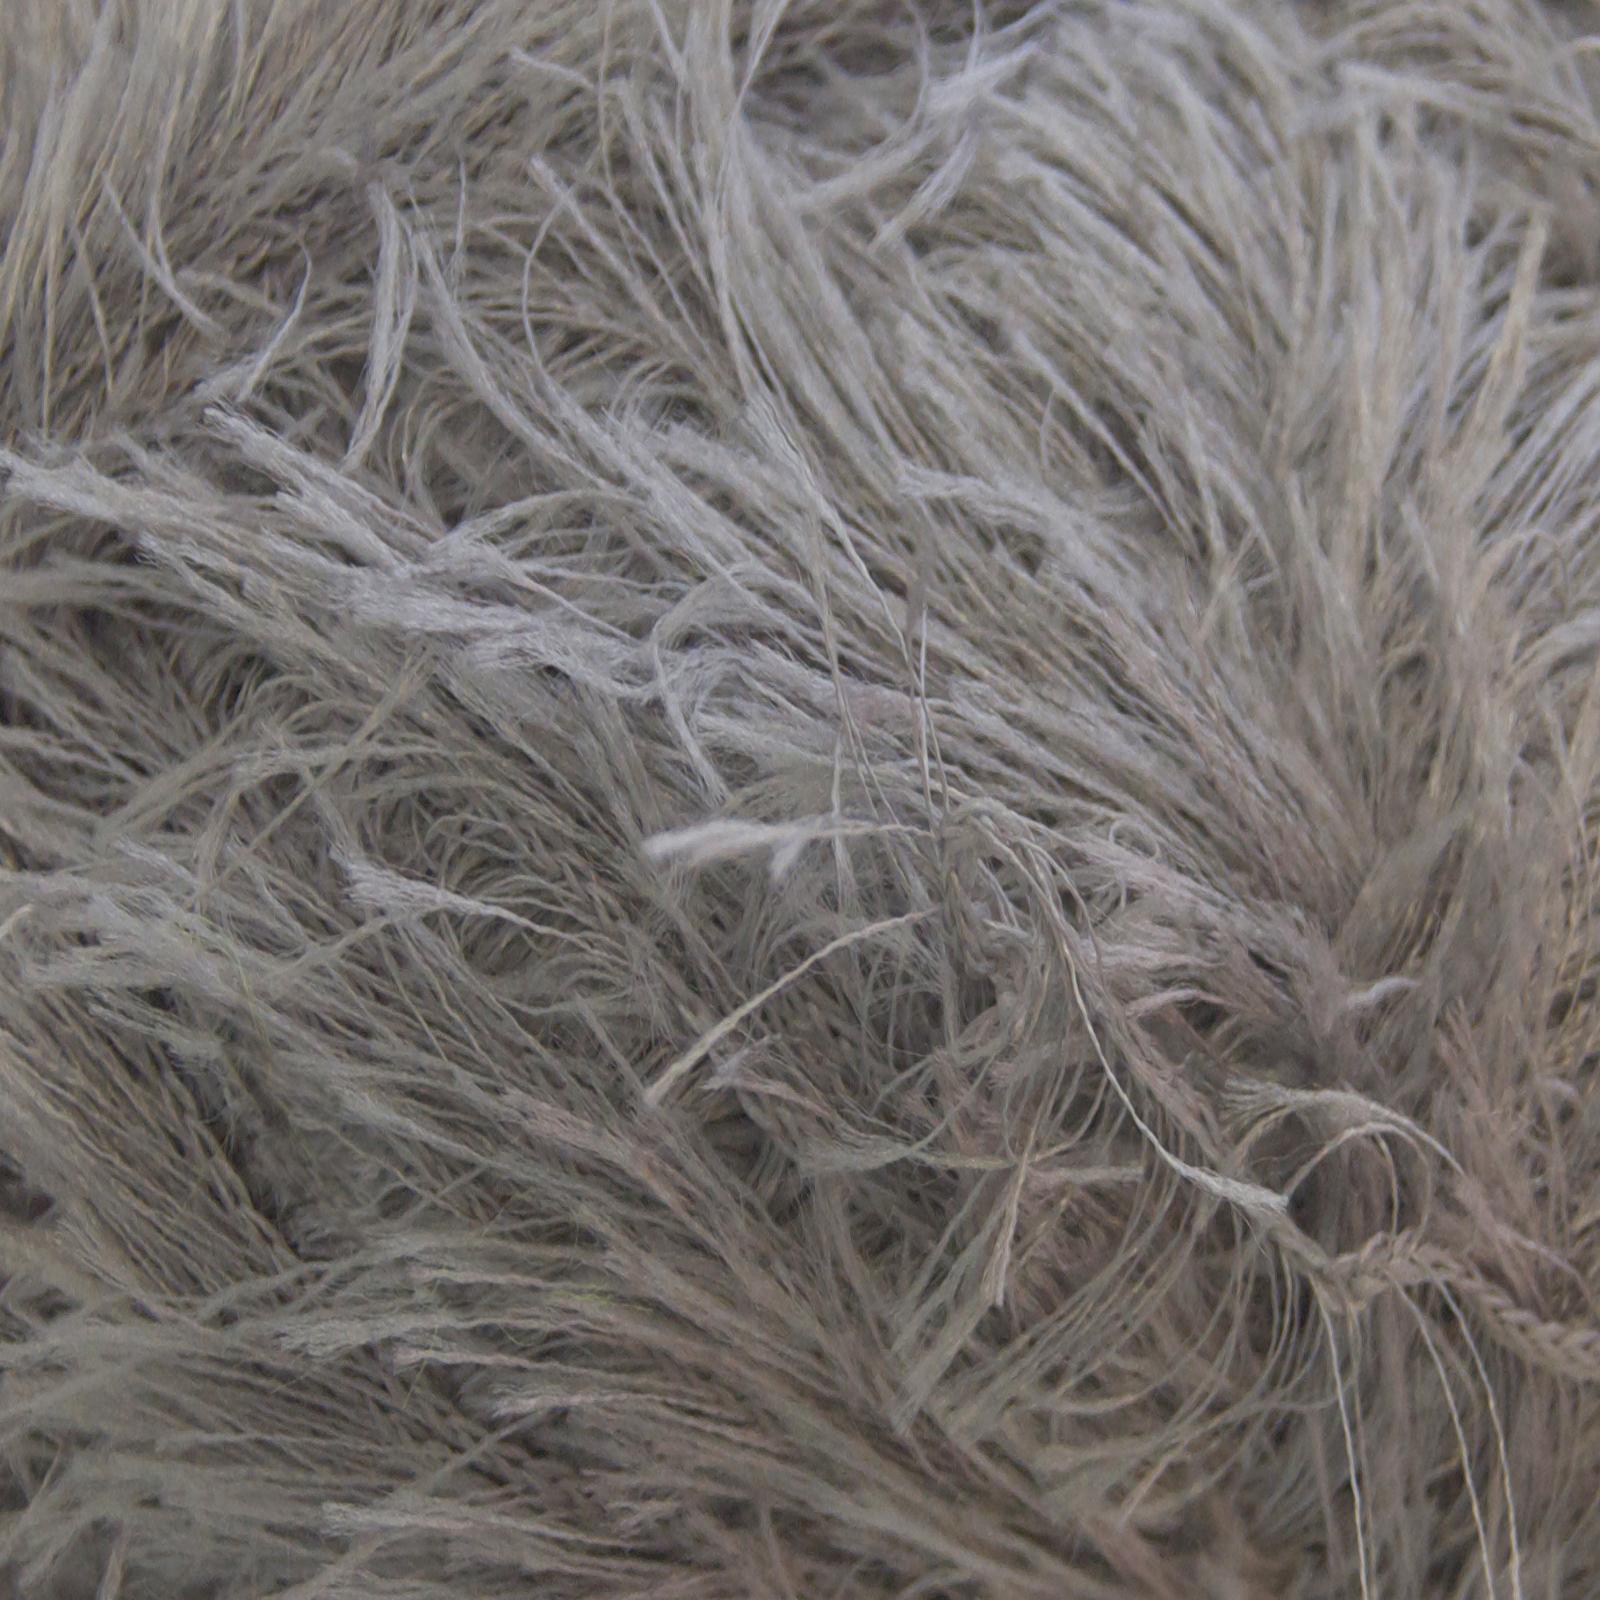 Feather Yarn Knitting Patterns : Moments Knitting Yarn King Cole 50g Ball Fluffy Eyelash Feather Style Teddy Wool